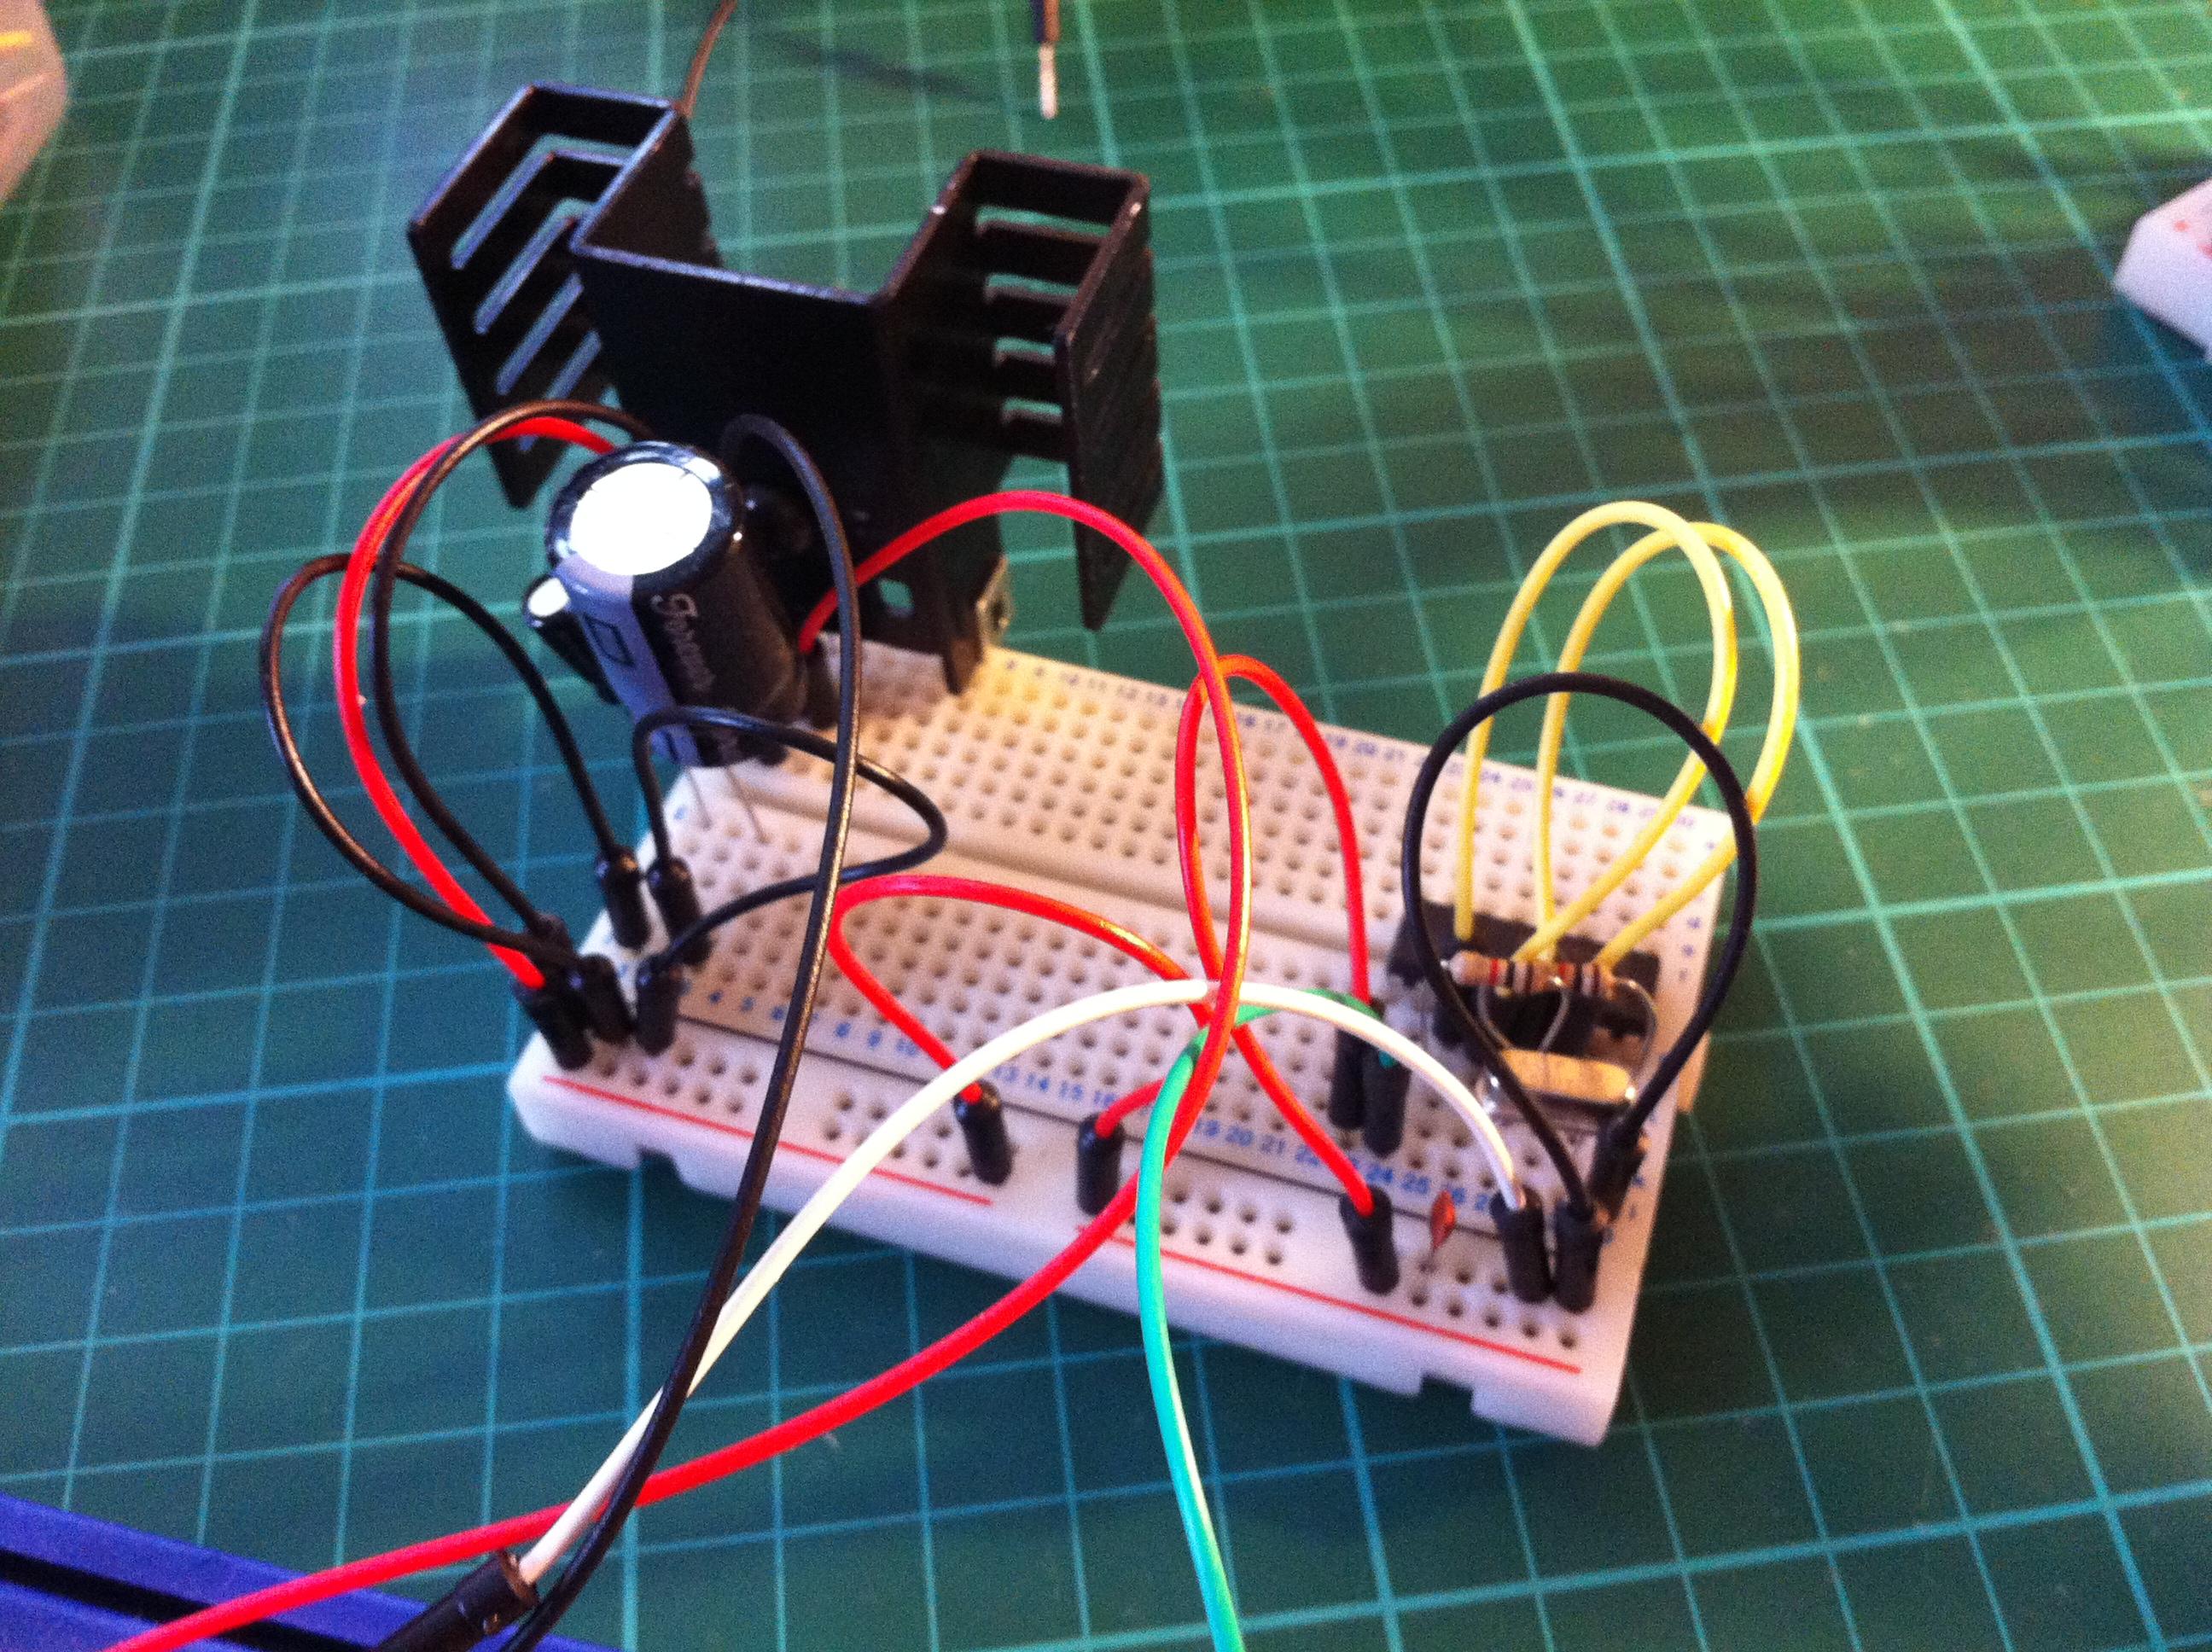 Prototype Power Supply and Clock